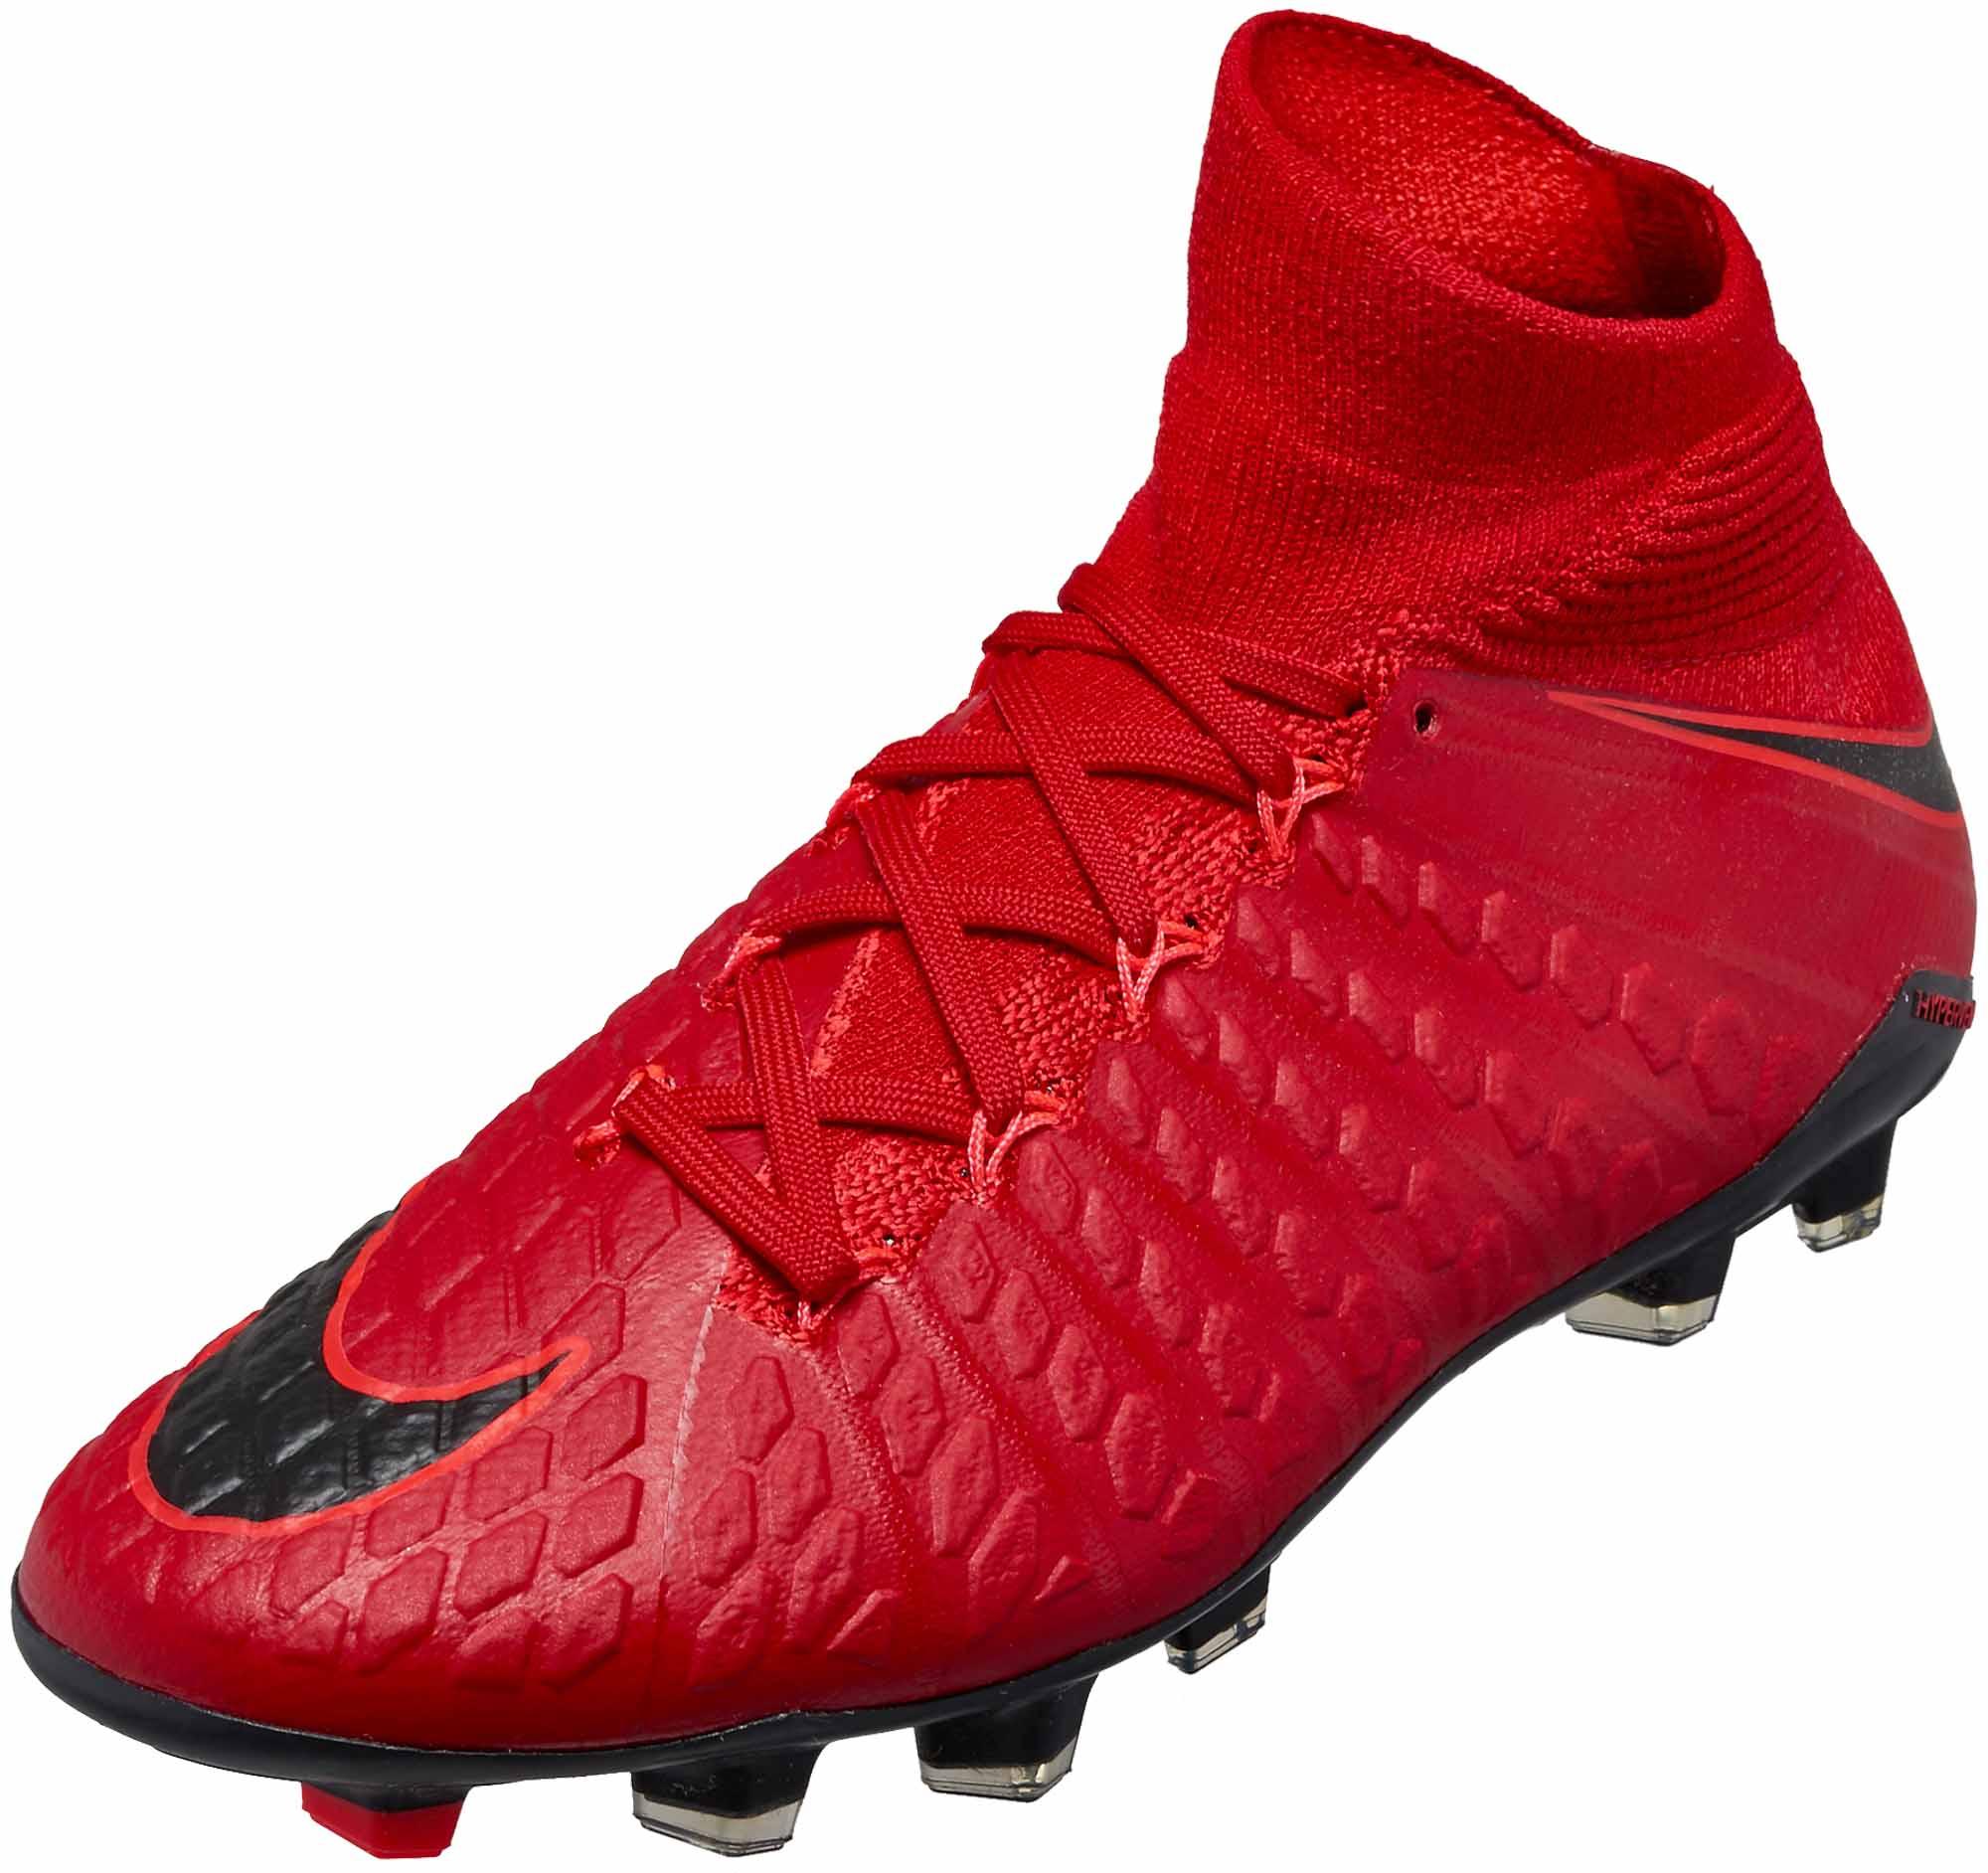 215fe0e7ac5 Nike Kids Hypervenom Phantom III FG – University Red Black